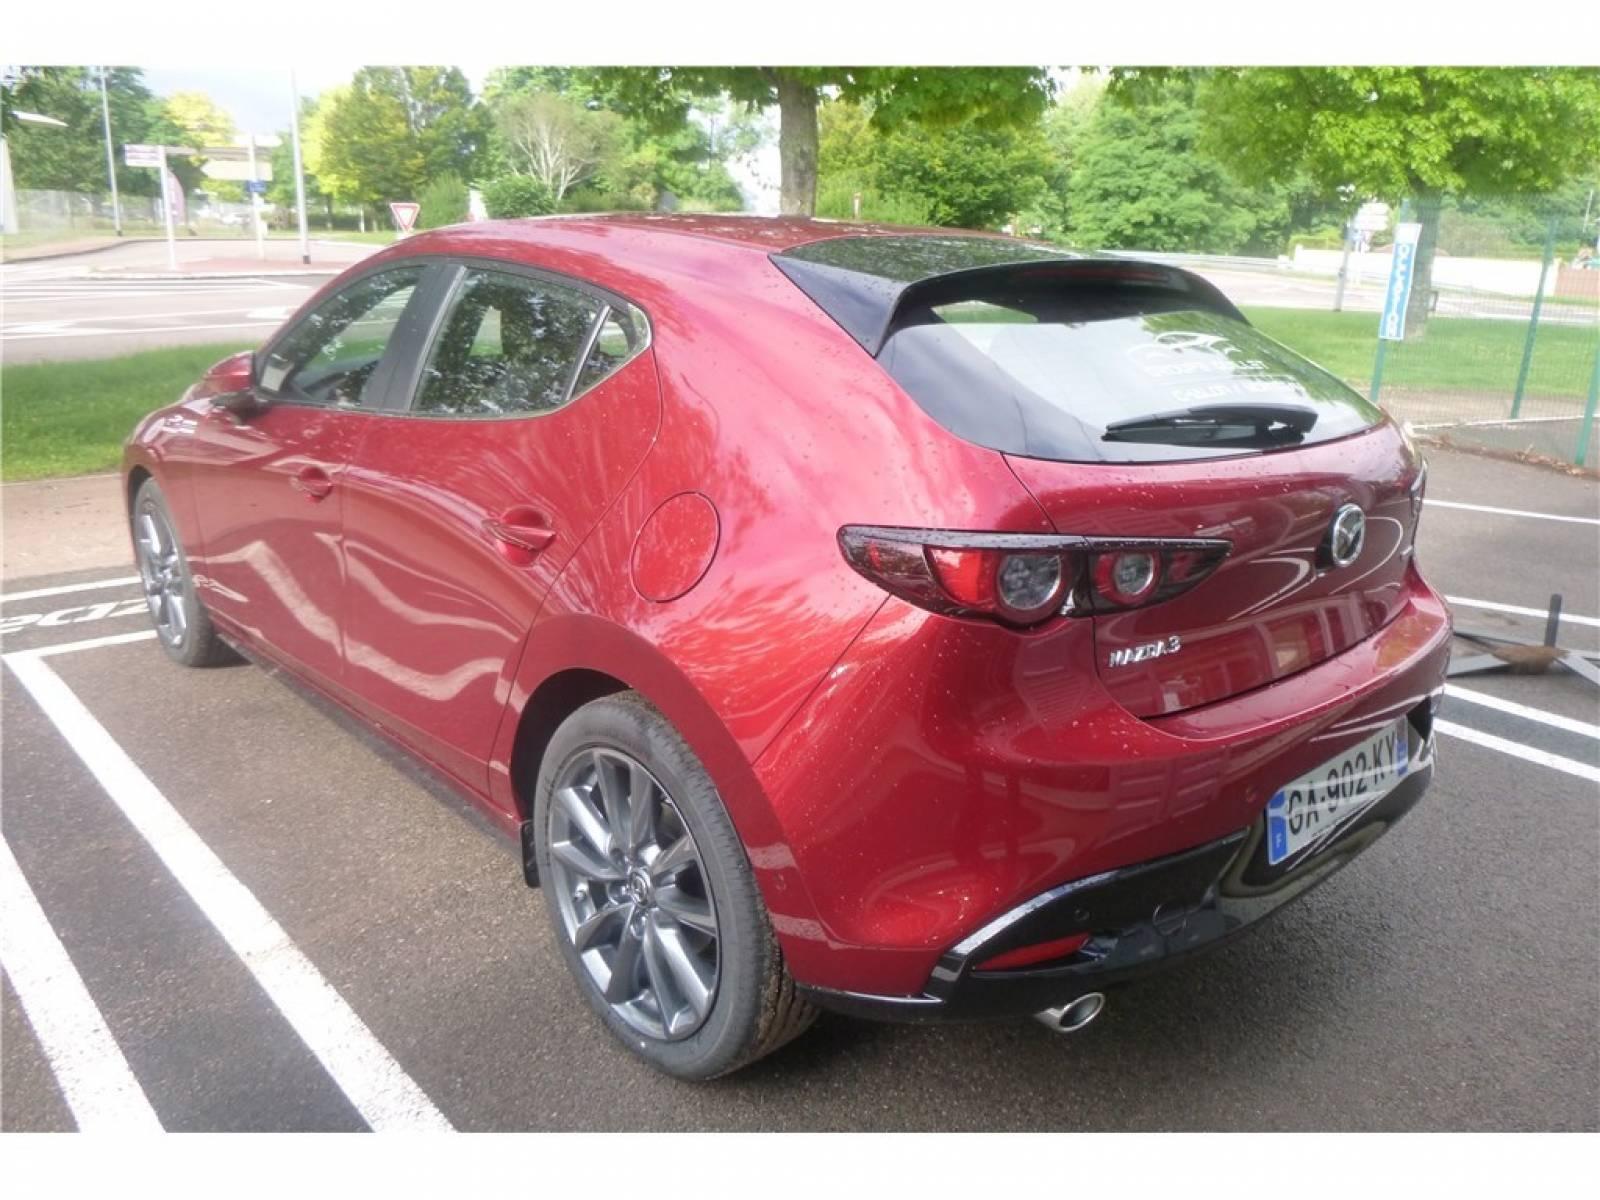 MAZDA Mazda3 5 portes 2.0L e-SKYACTIV-G M Hybrid 122 ch BVA6 - véhicule d'occasion - Groupe Guillet - Chalon Automobiles - 71100 - Chalon-sur-Saône - 8